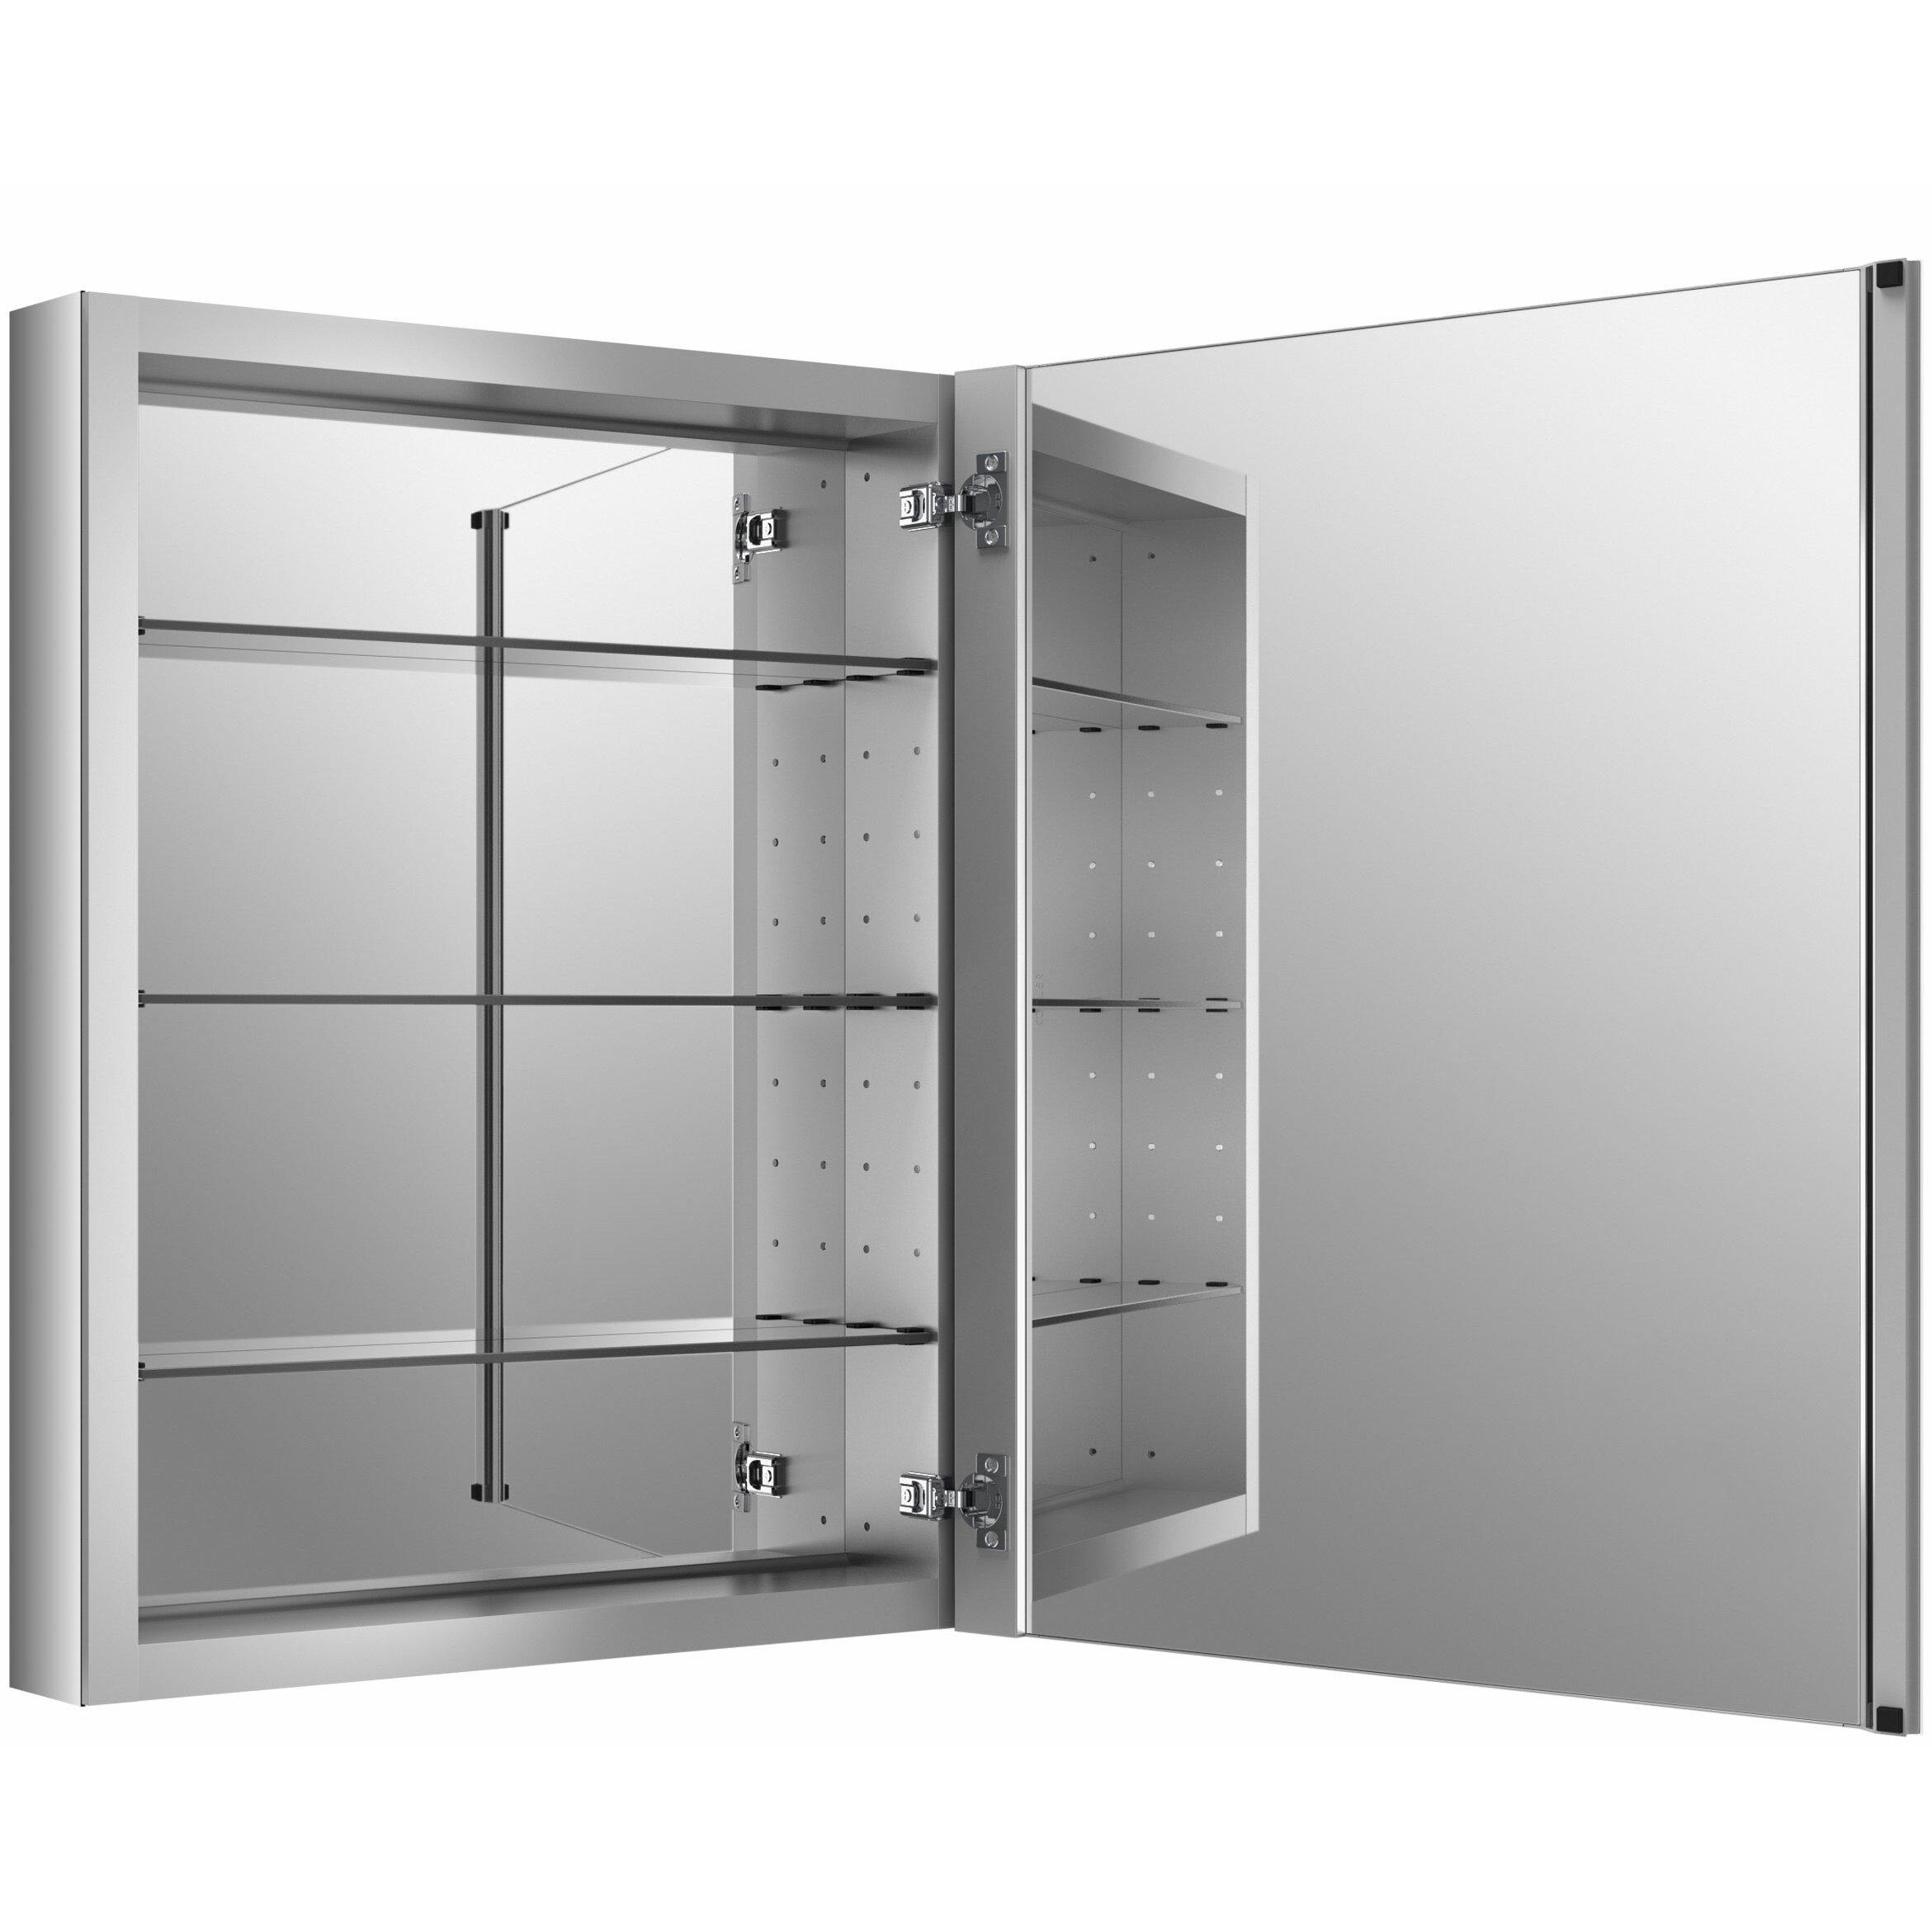 30 X 30 Medicine Cabinet Kohler Verdera 24 W X 30 H Aluminum Medicine Cabinet Reviews